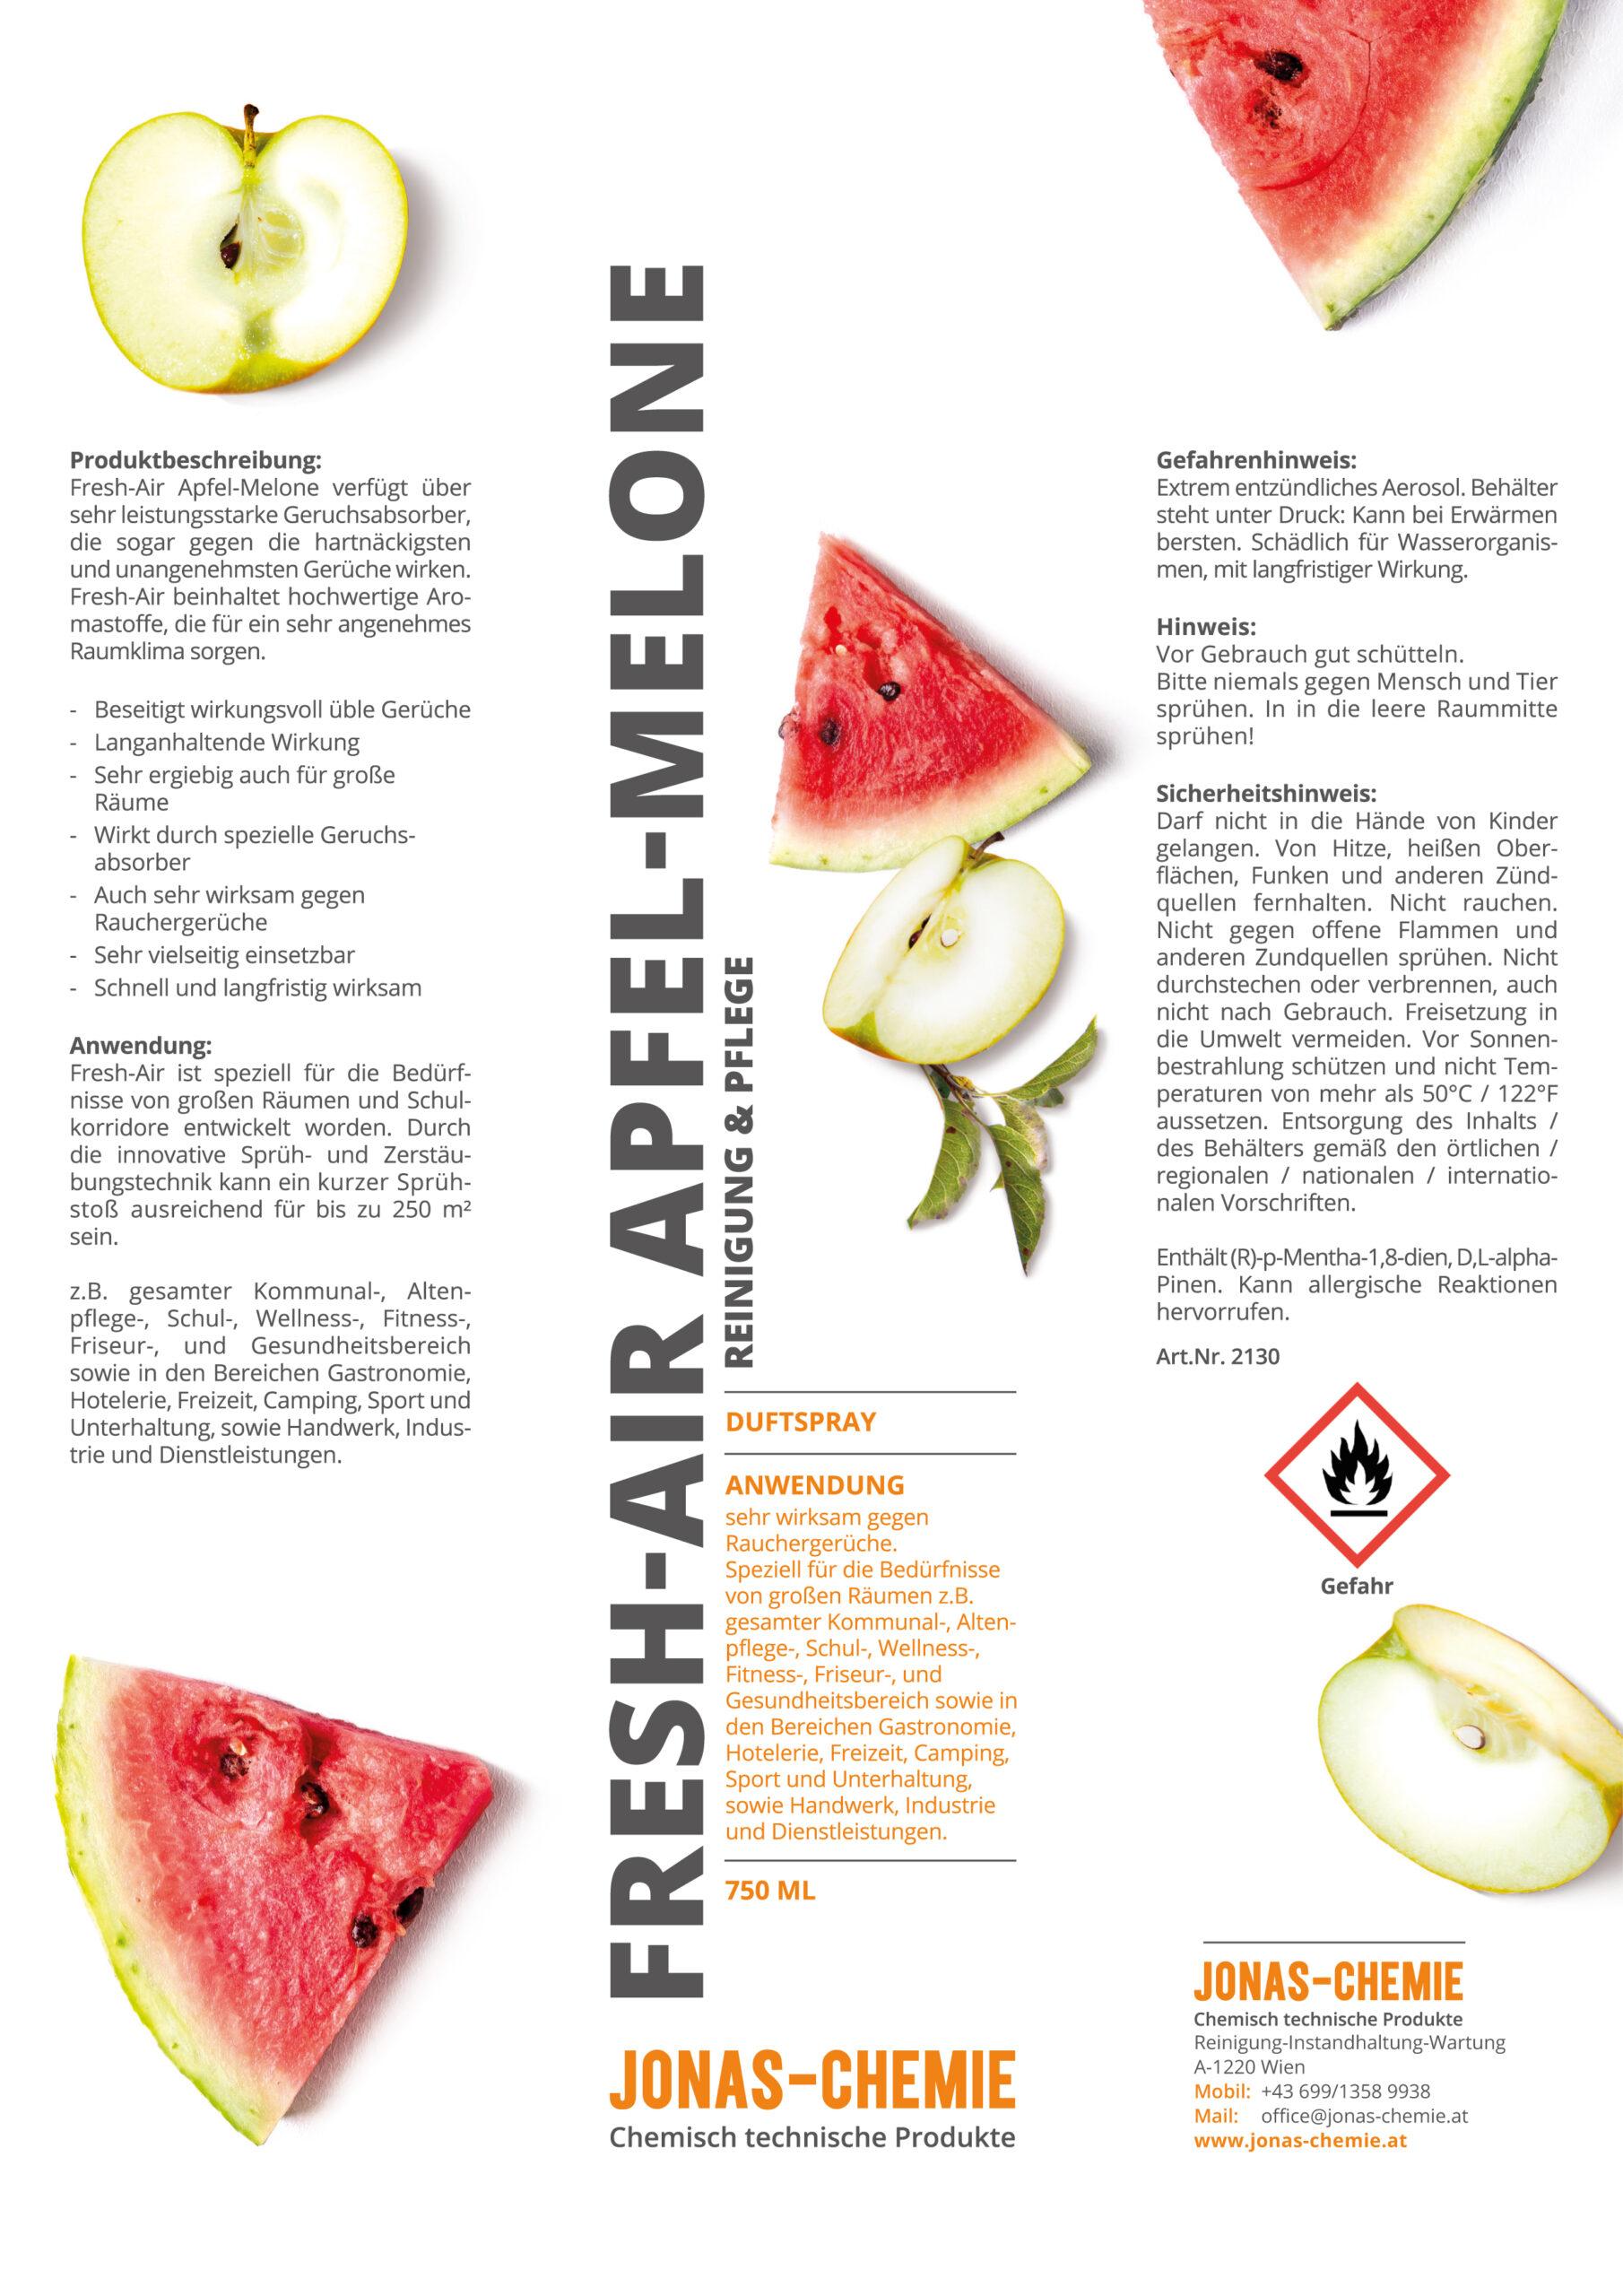 Jonas-Chemie_Aufkleber-Dose_Reiniger_210x297_gr_FreshAir_Apfel-M